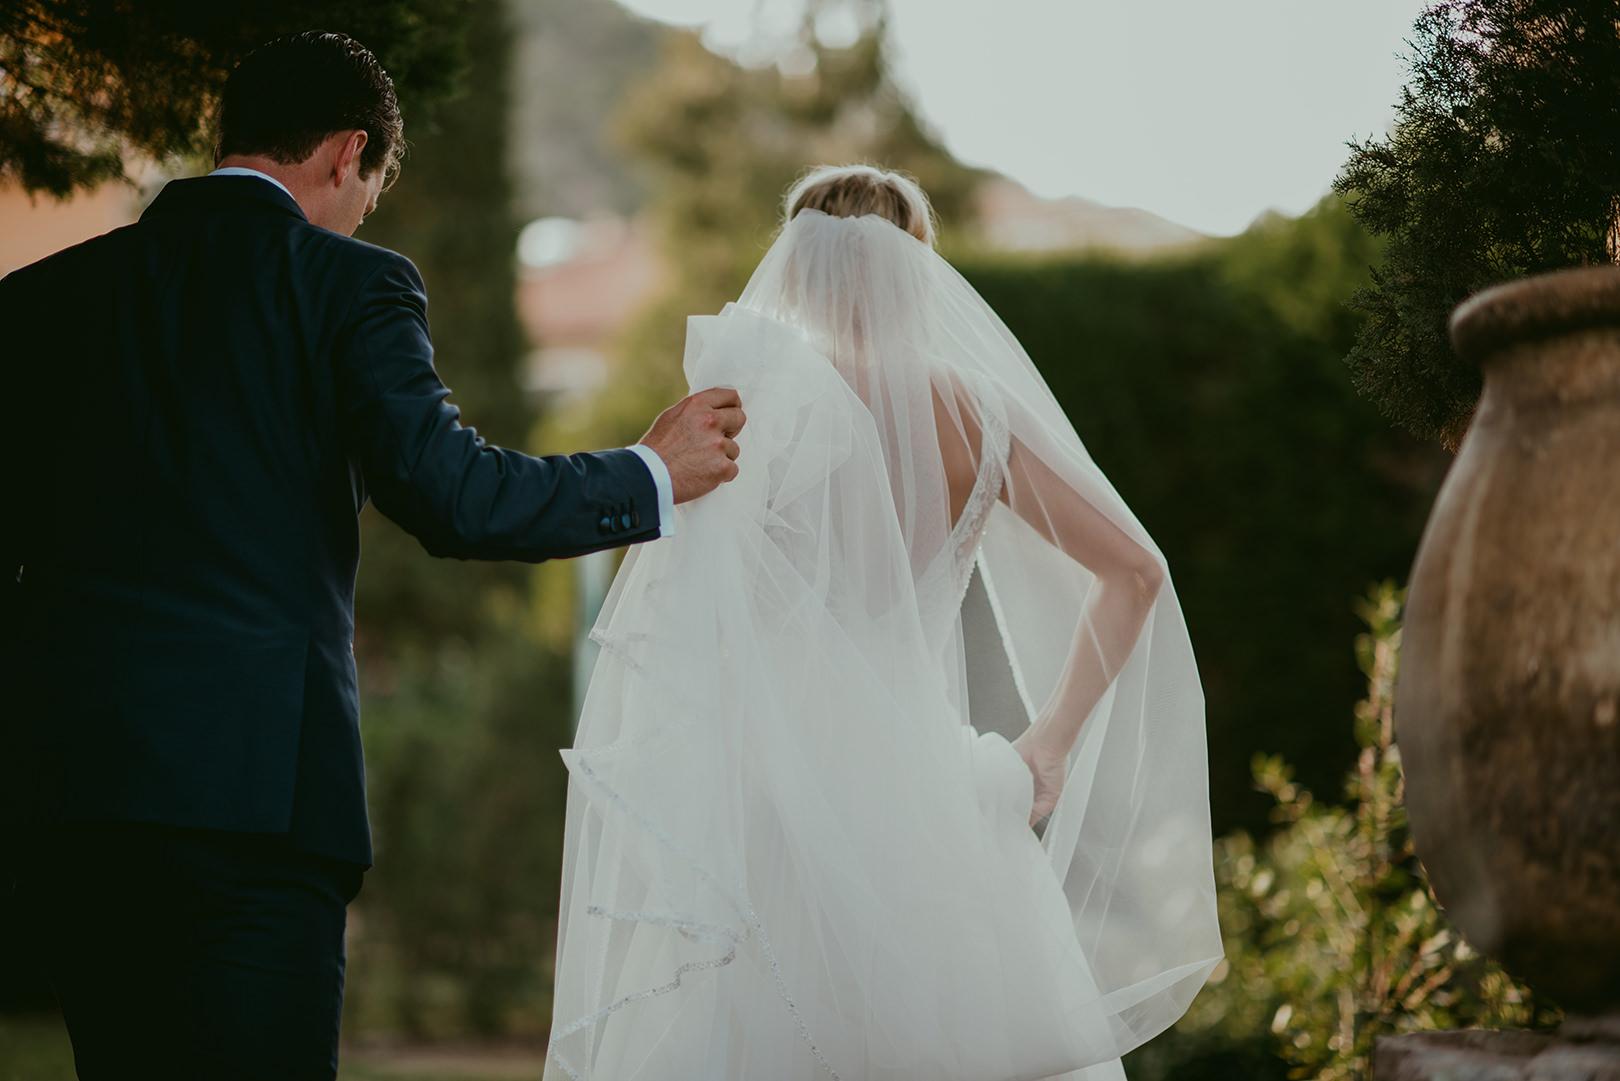 Bride and groom at Chateau de la Napoule in Cannes